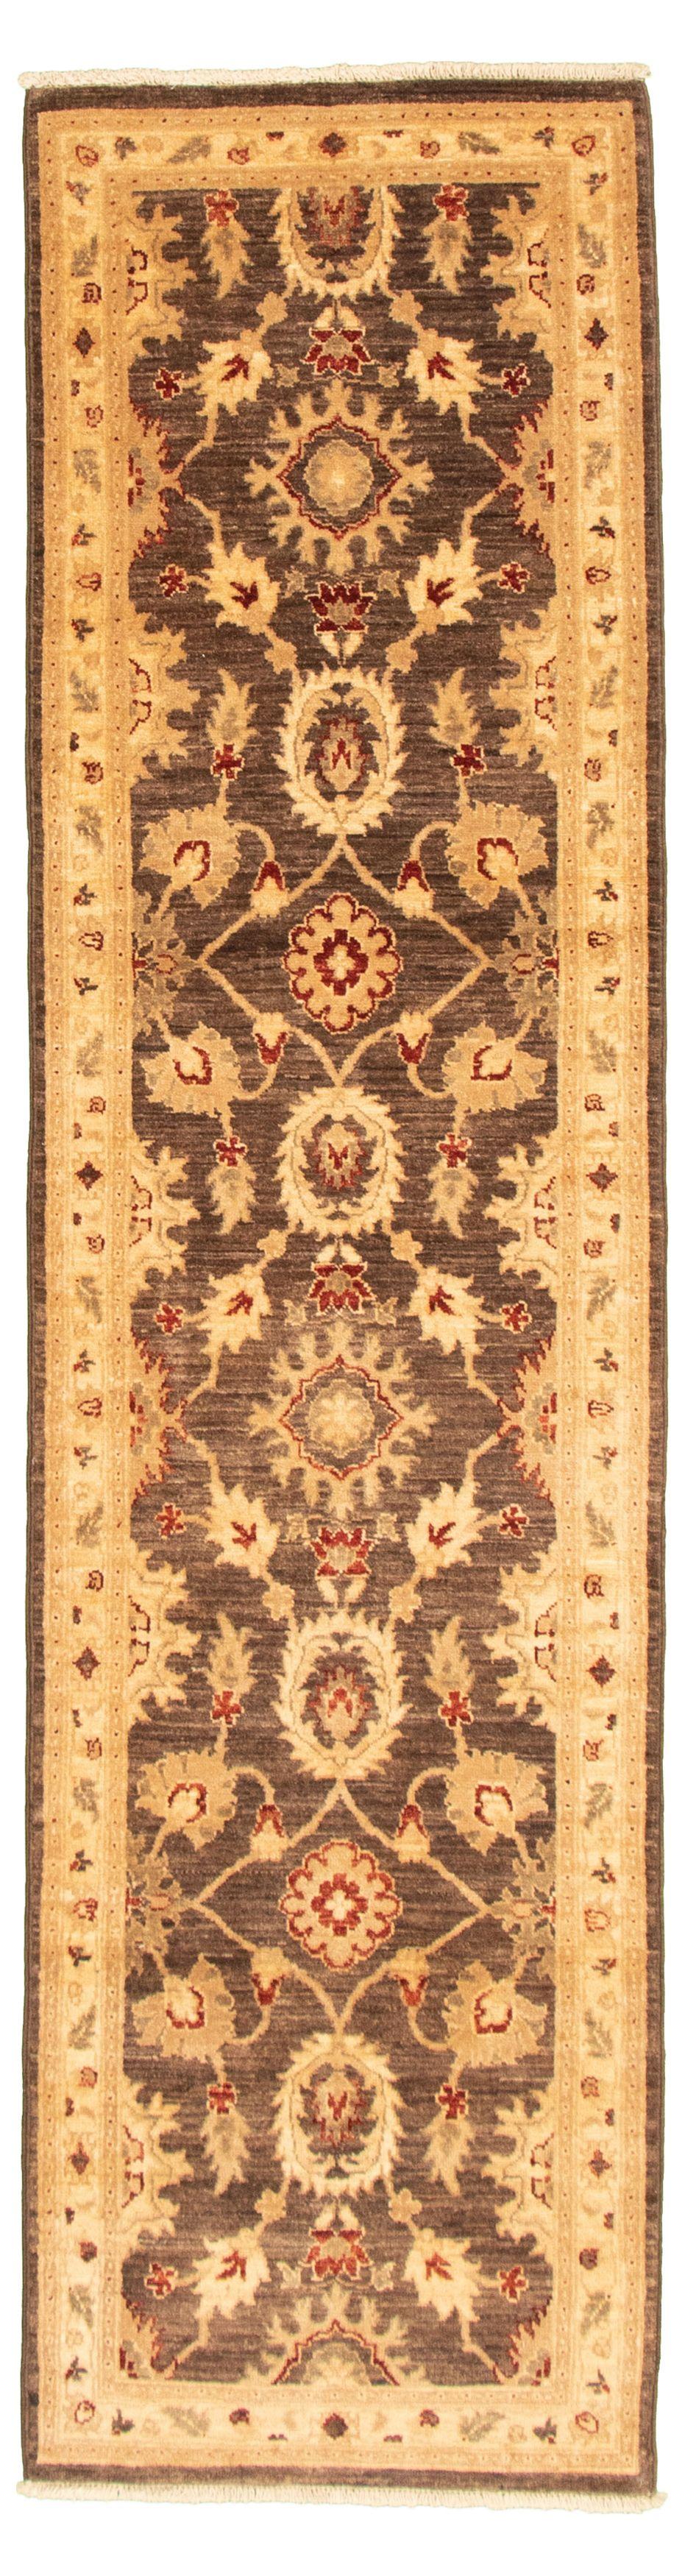 "Hand-knotted Chobi Finest Dark Brown Wool Rug 2'7"" x 9'10"" Size: 2'7"" x 9'10"""